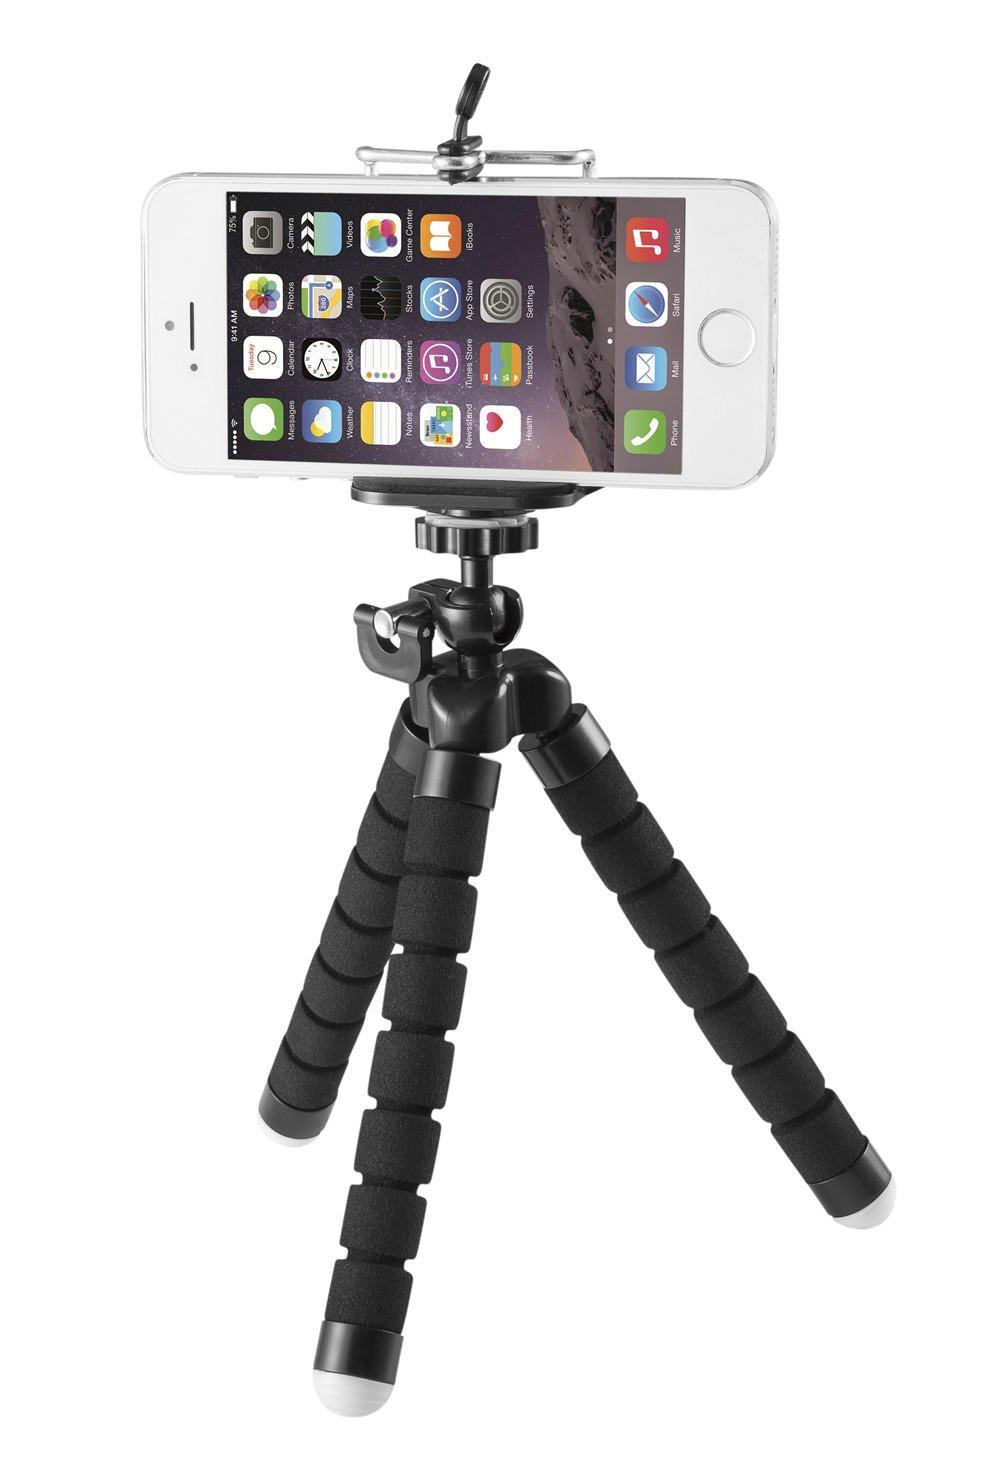 Flexible Tripod, Mini Stand Holder, Universal Travel Portable Tripod for Iphone,Phone,Smartphone, iPad, Digital Camera, Gopro -PrimeCables®